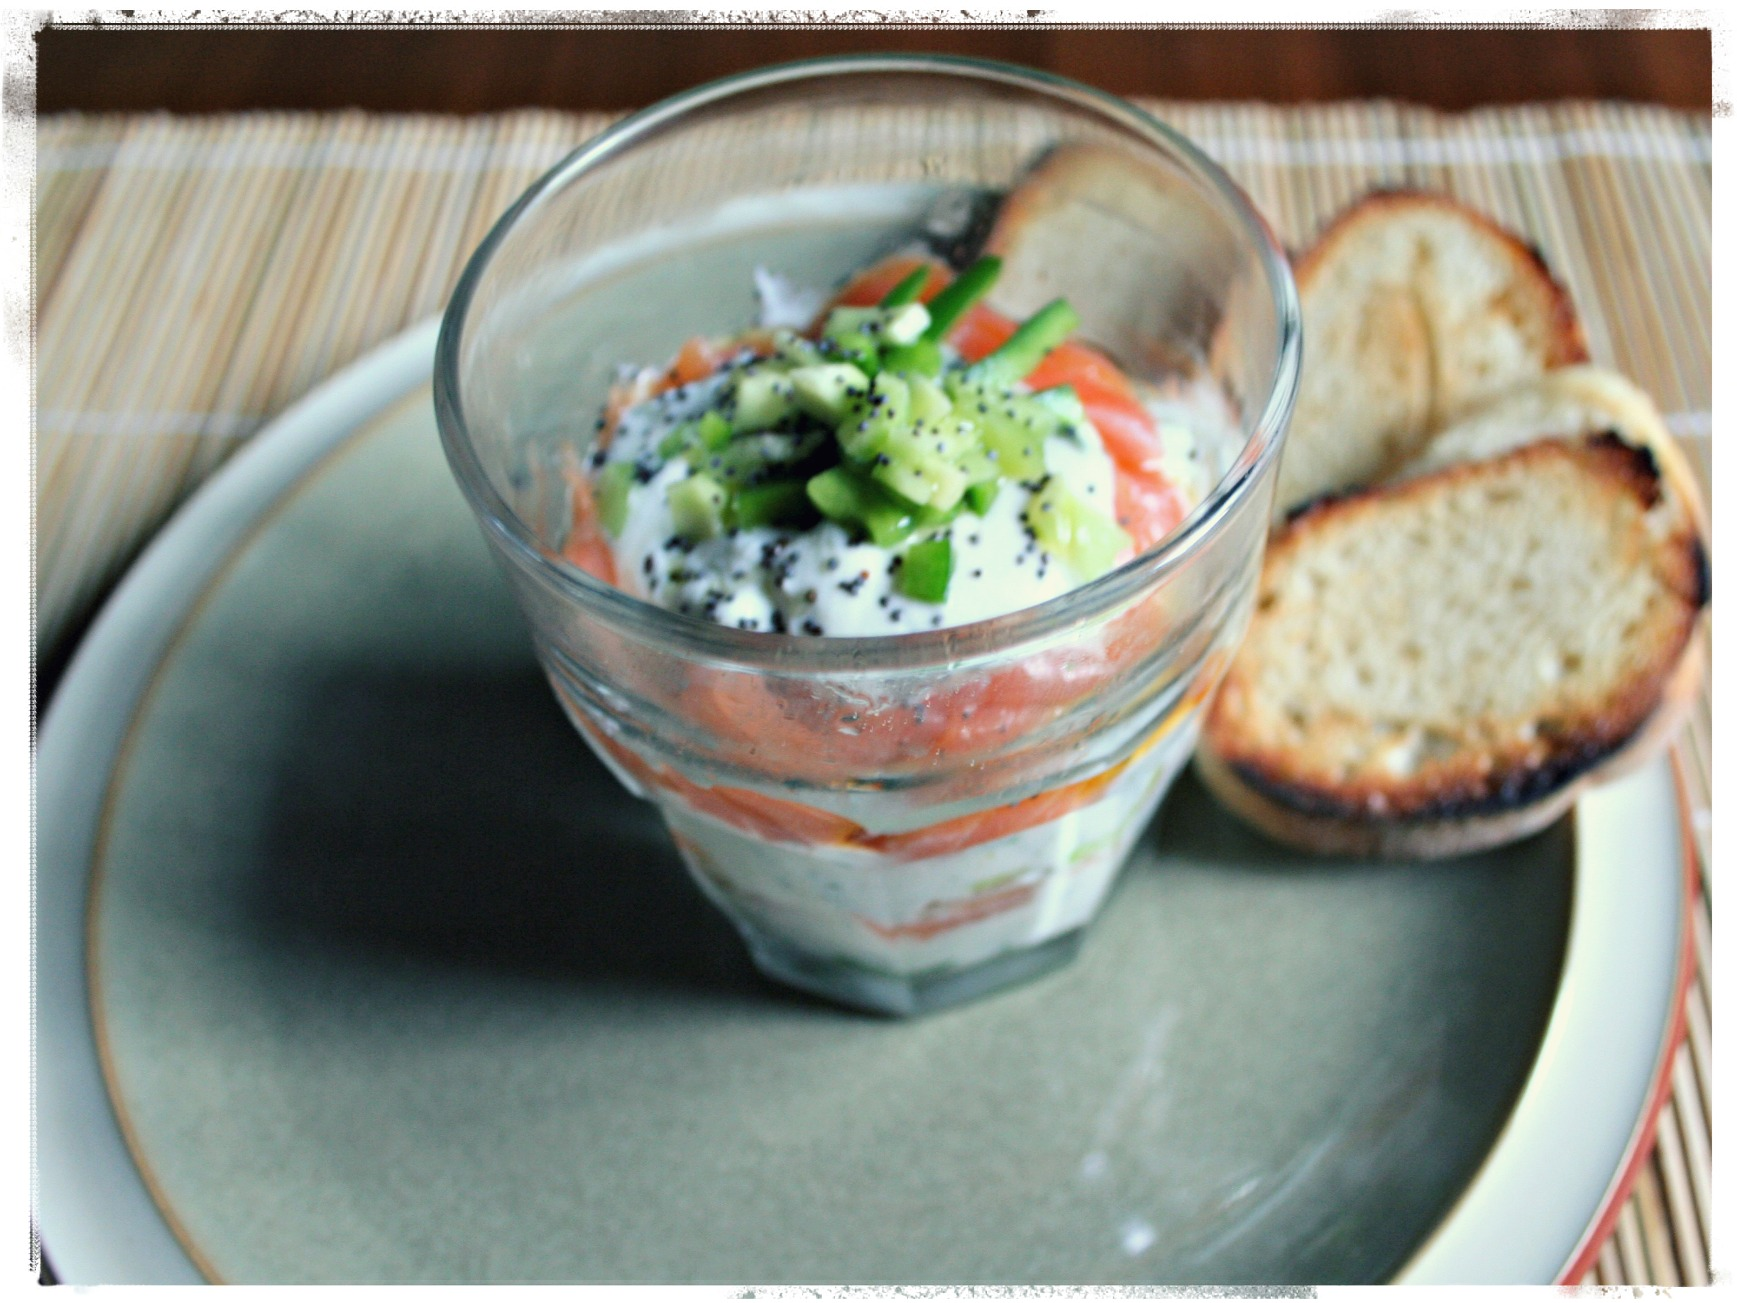 Ricetta Salmone Affumicato E Yogurt Greco.Salmone Affumicato E Yogurt Greco Con Le Mani In Pasta